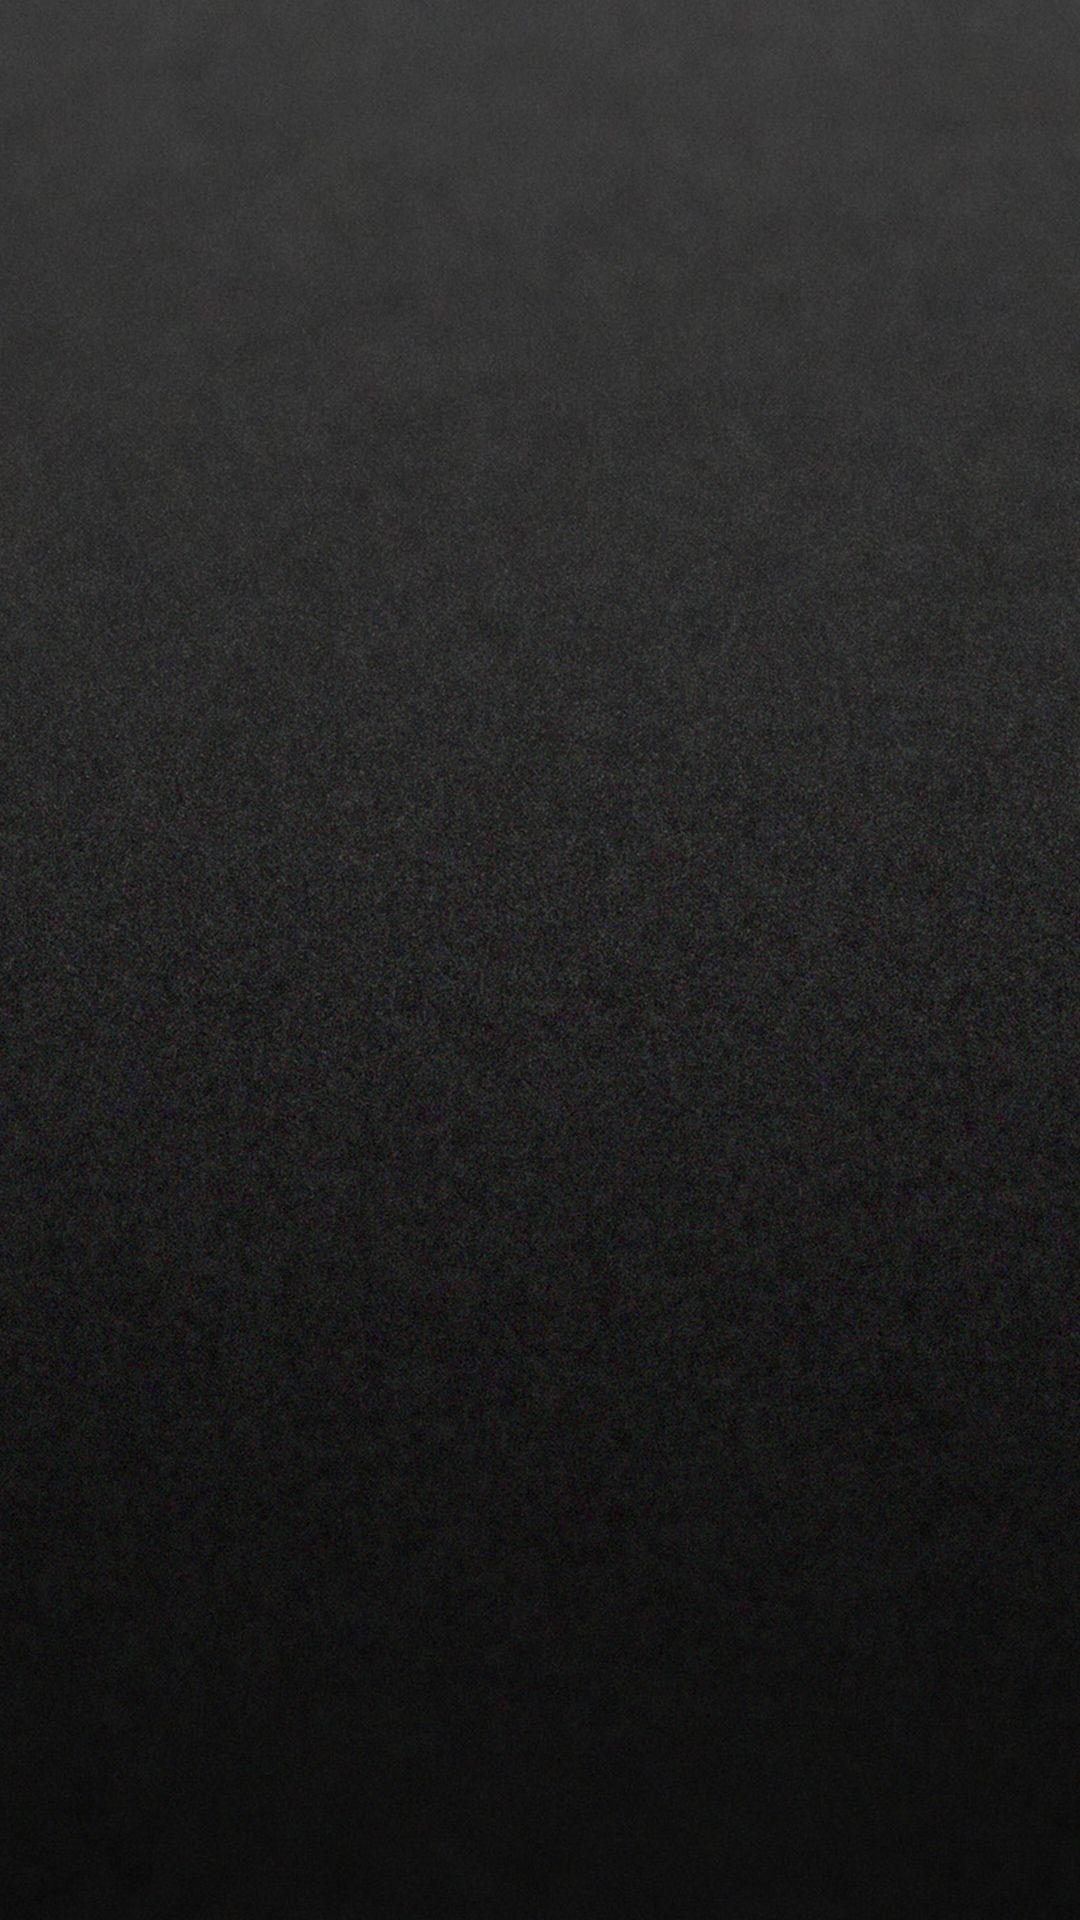 Carbon Fiber iPhone Background Free Download | PixelsTalk.Net